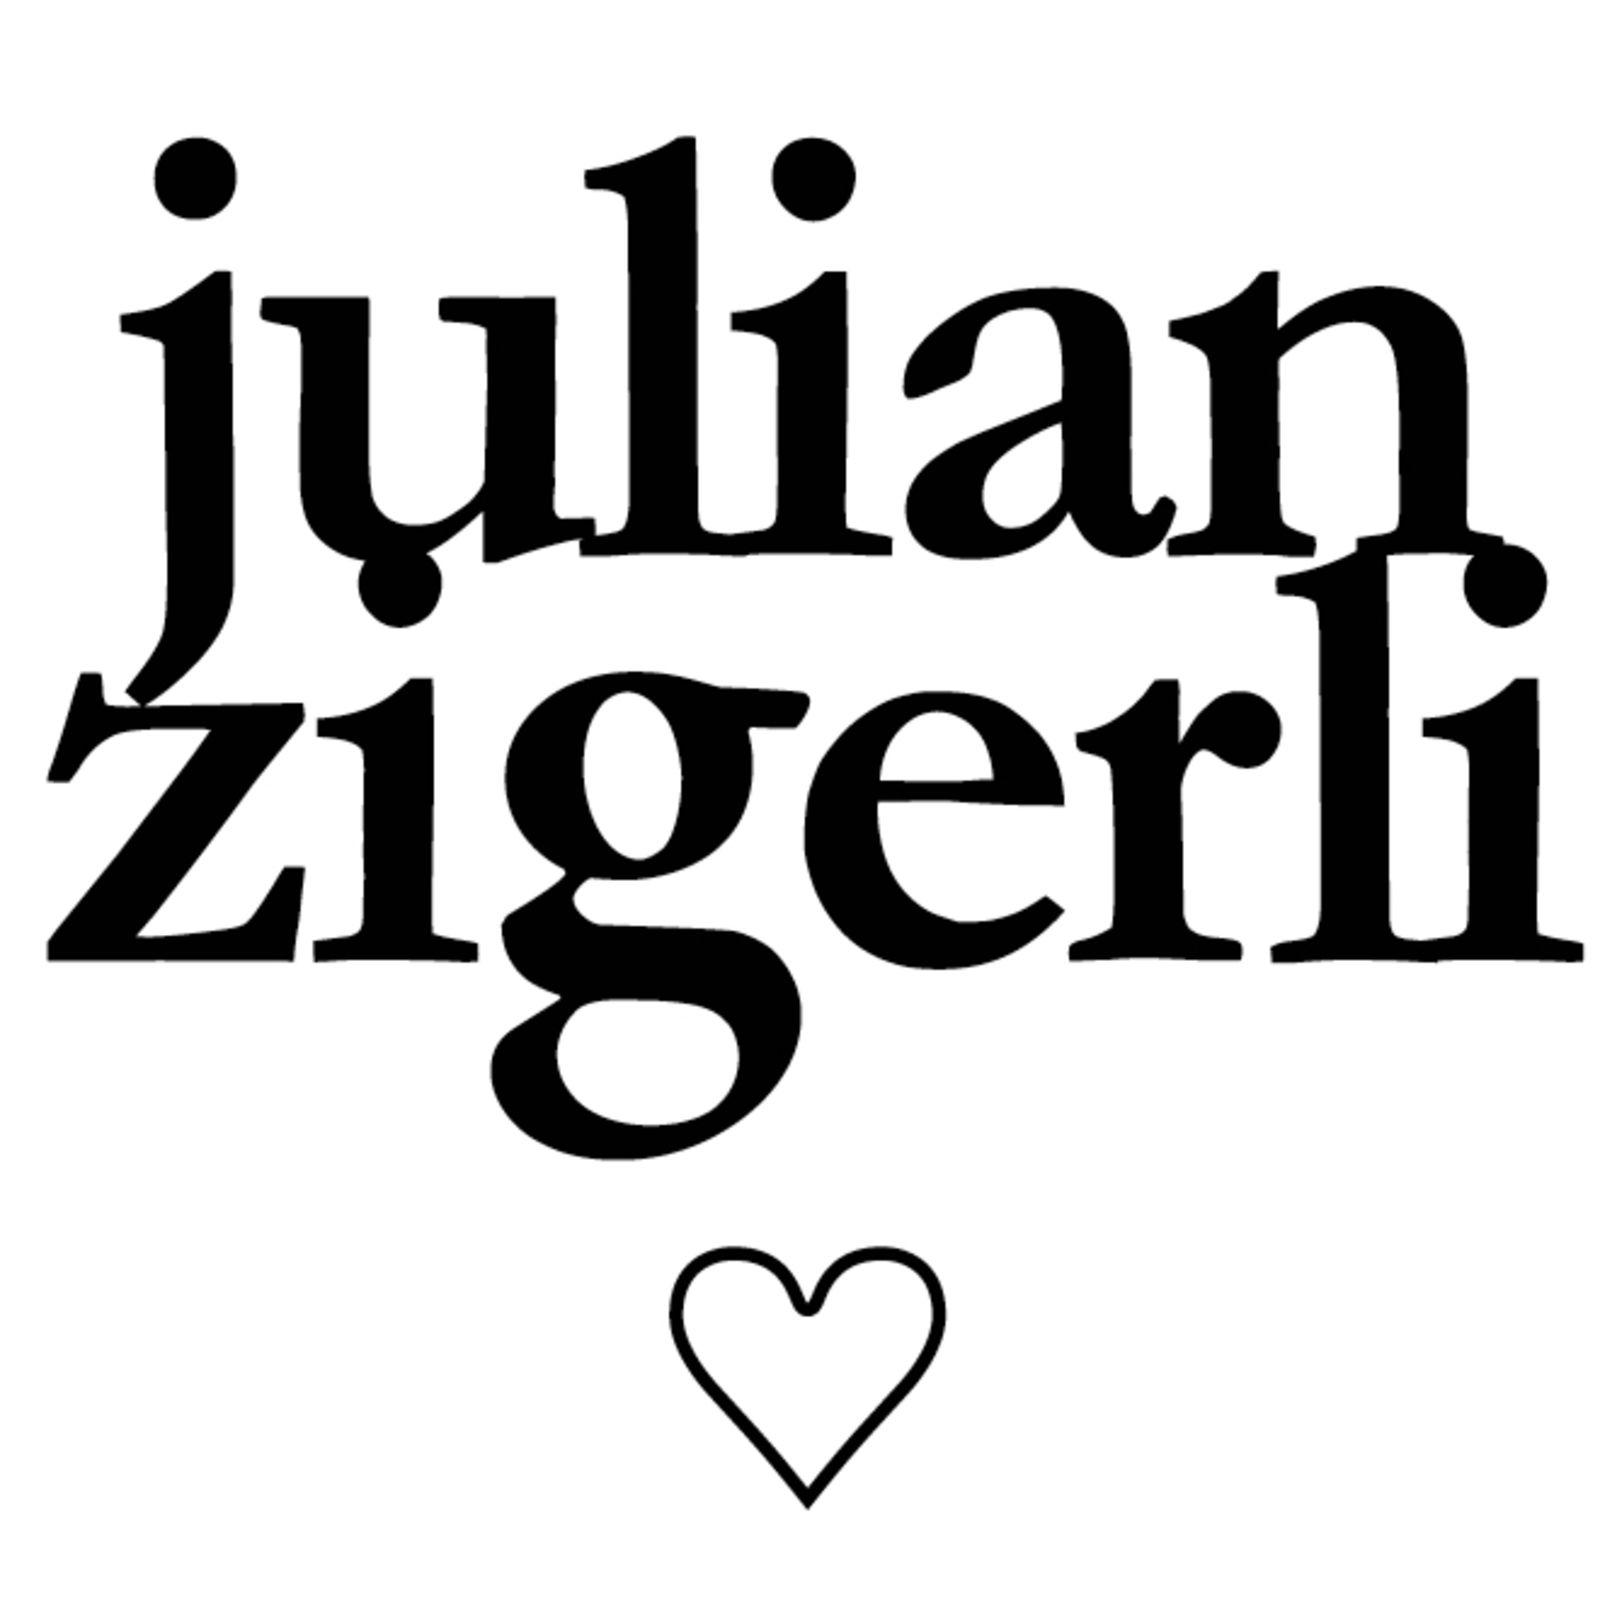 Julian Zigerli (Imagen 1)